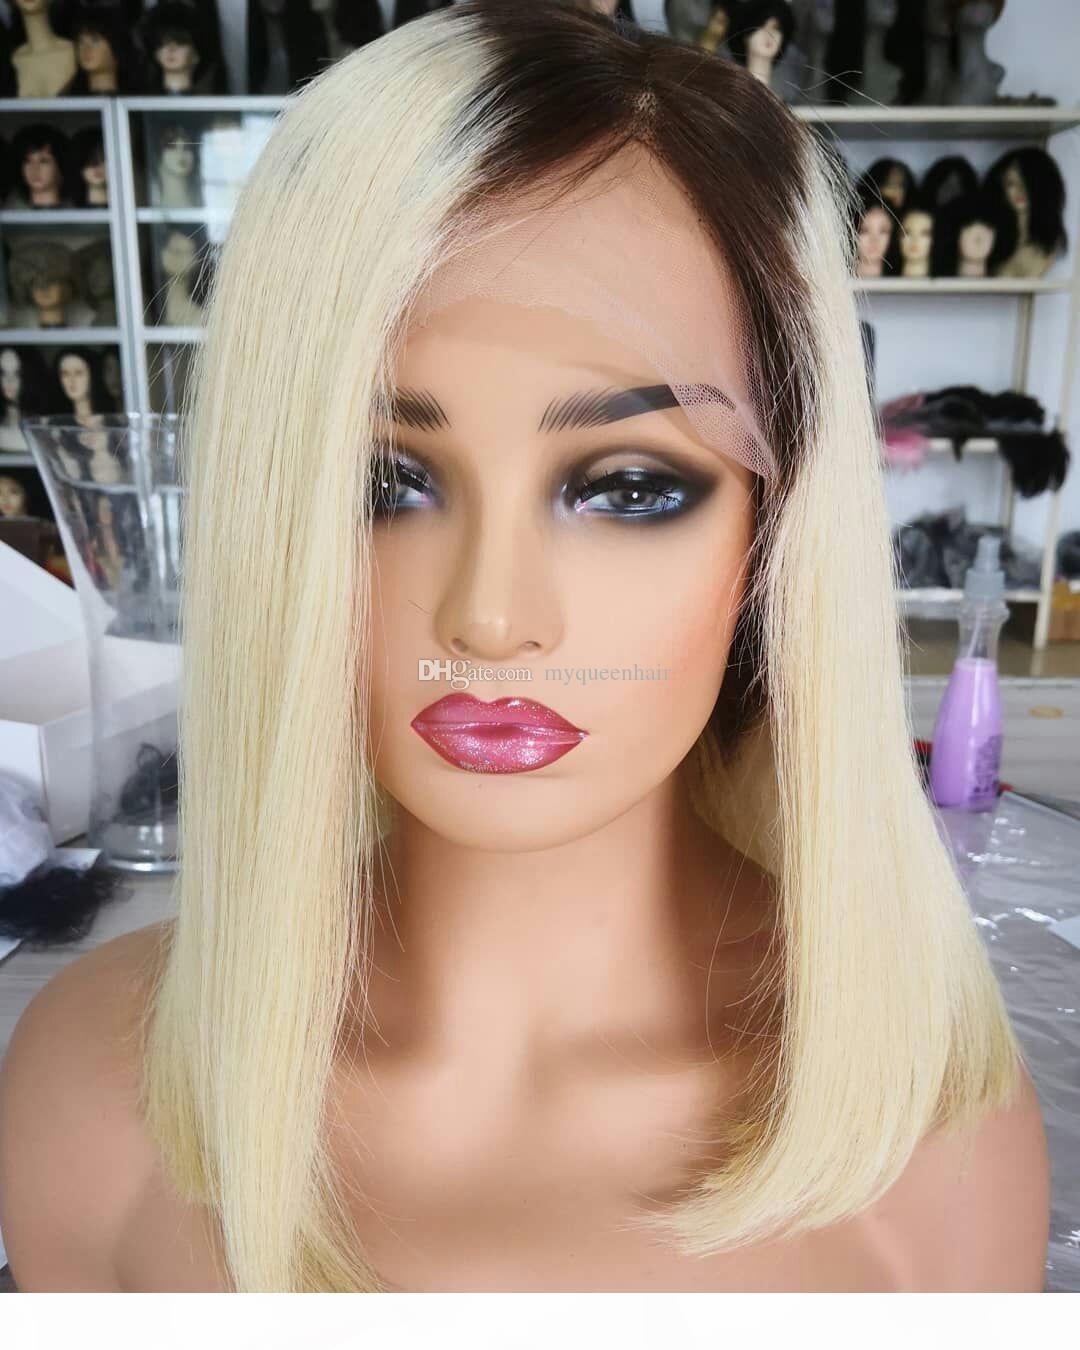 Lace front virgem humana cabelo loiro cor 1b 613 reto transparente bob perucas 150% cor ombre cor completa perucas